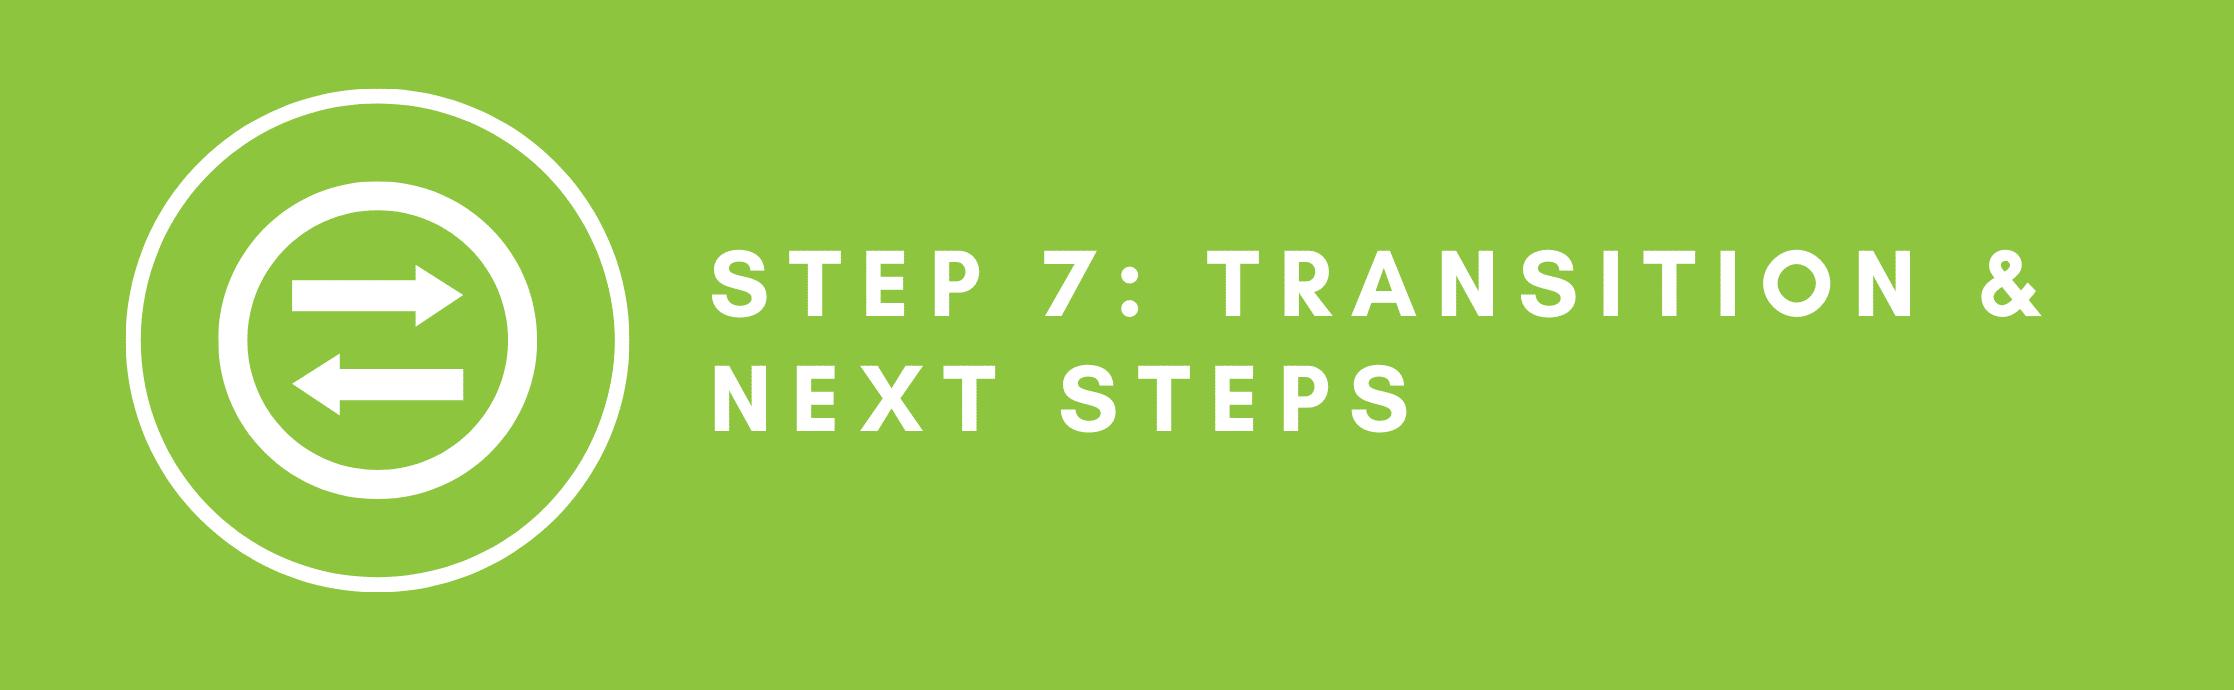 choosing-nonprofit-crm-software-step-7